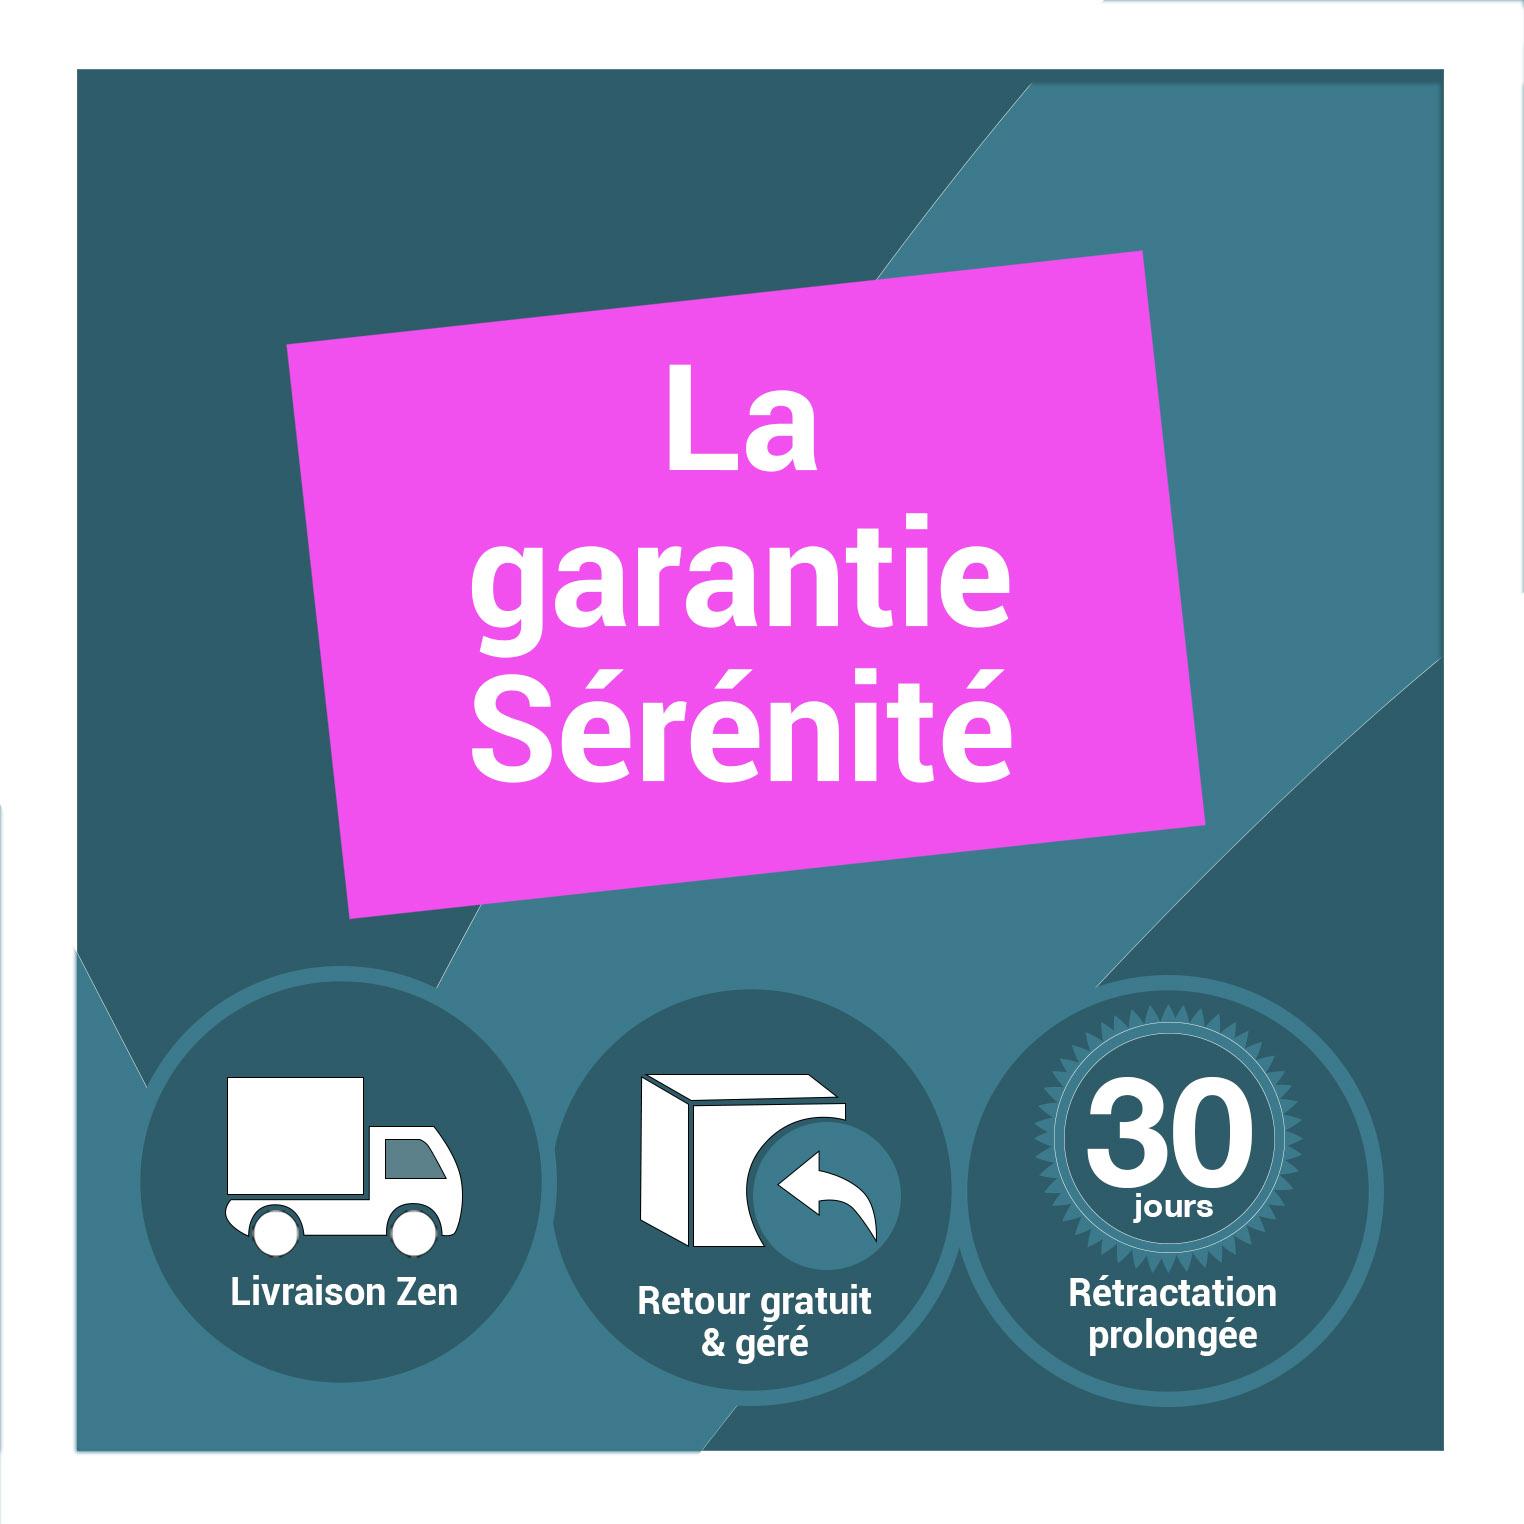 Garantie Sérénité - zoom